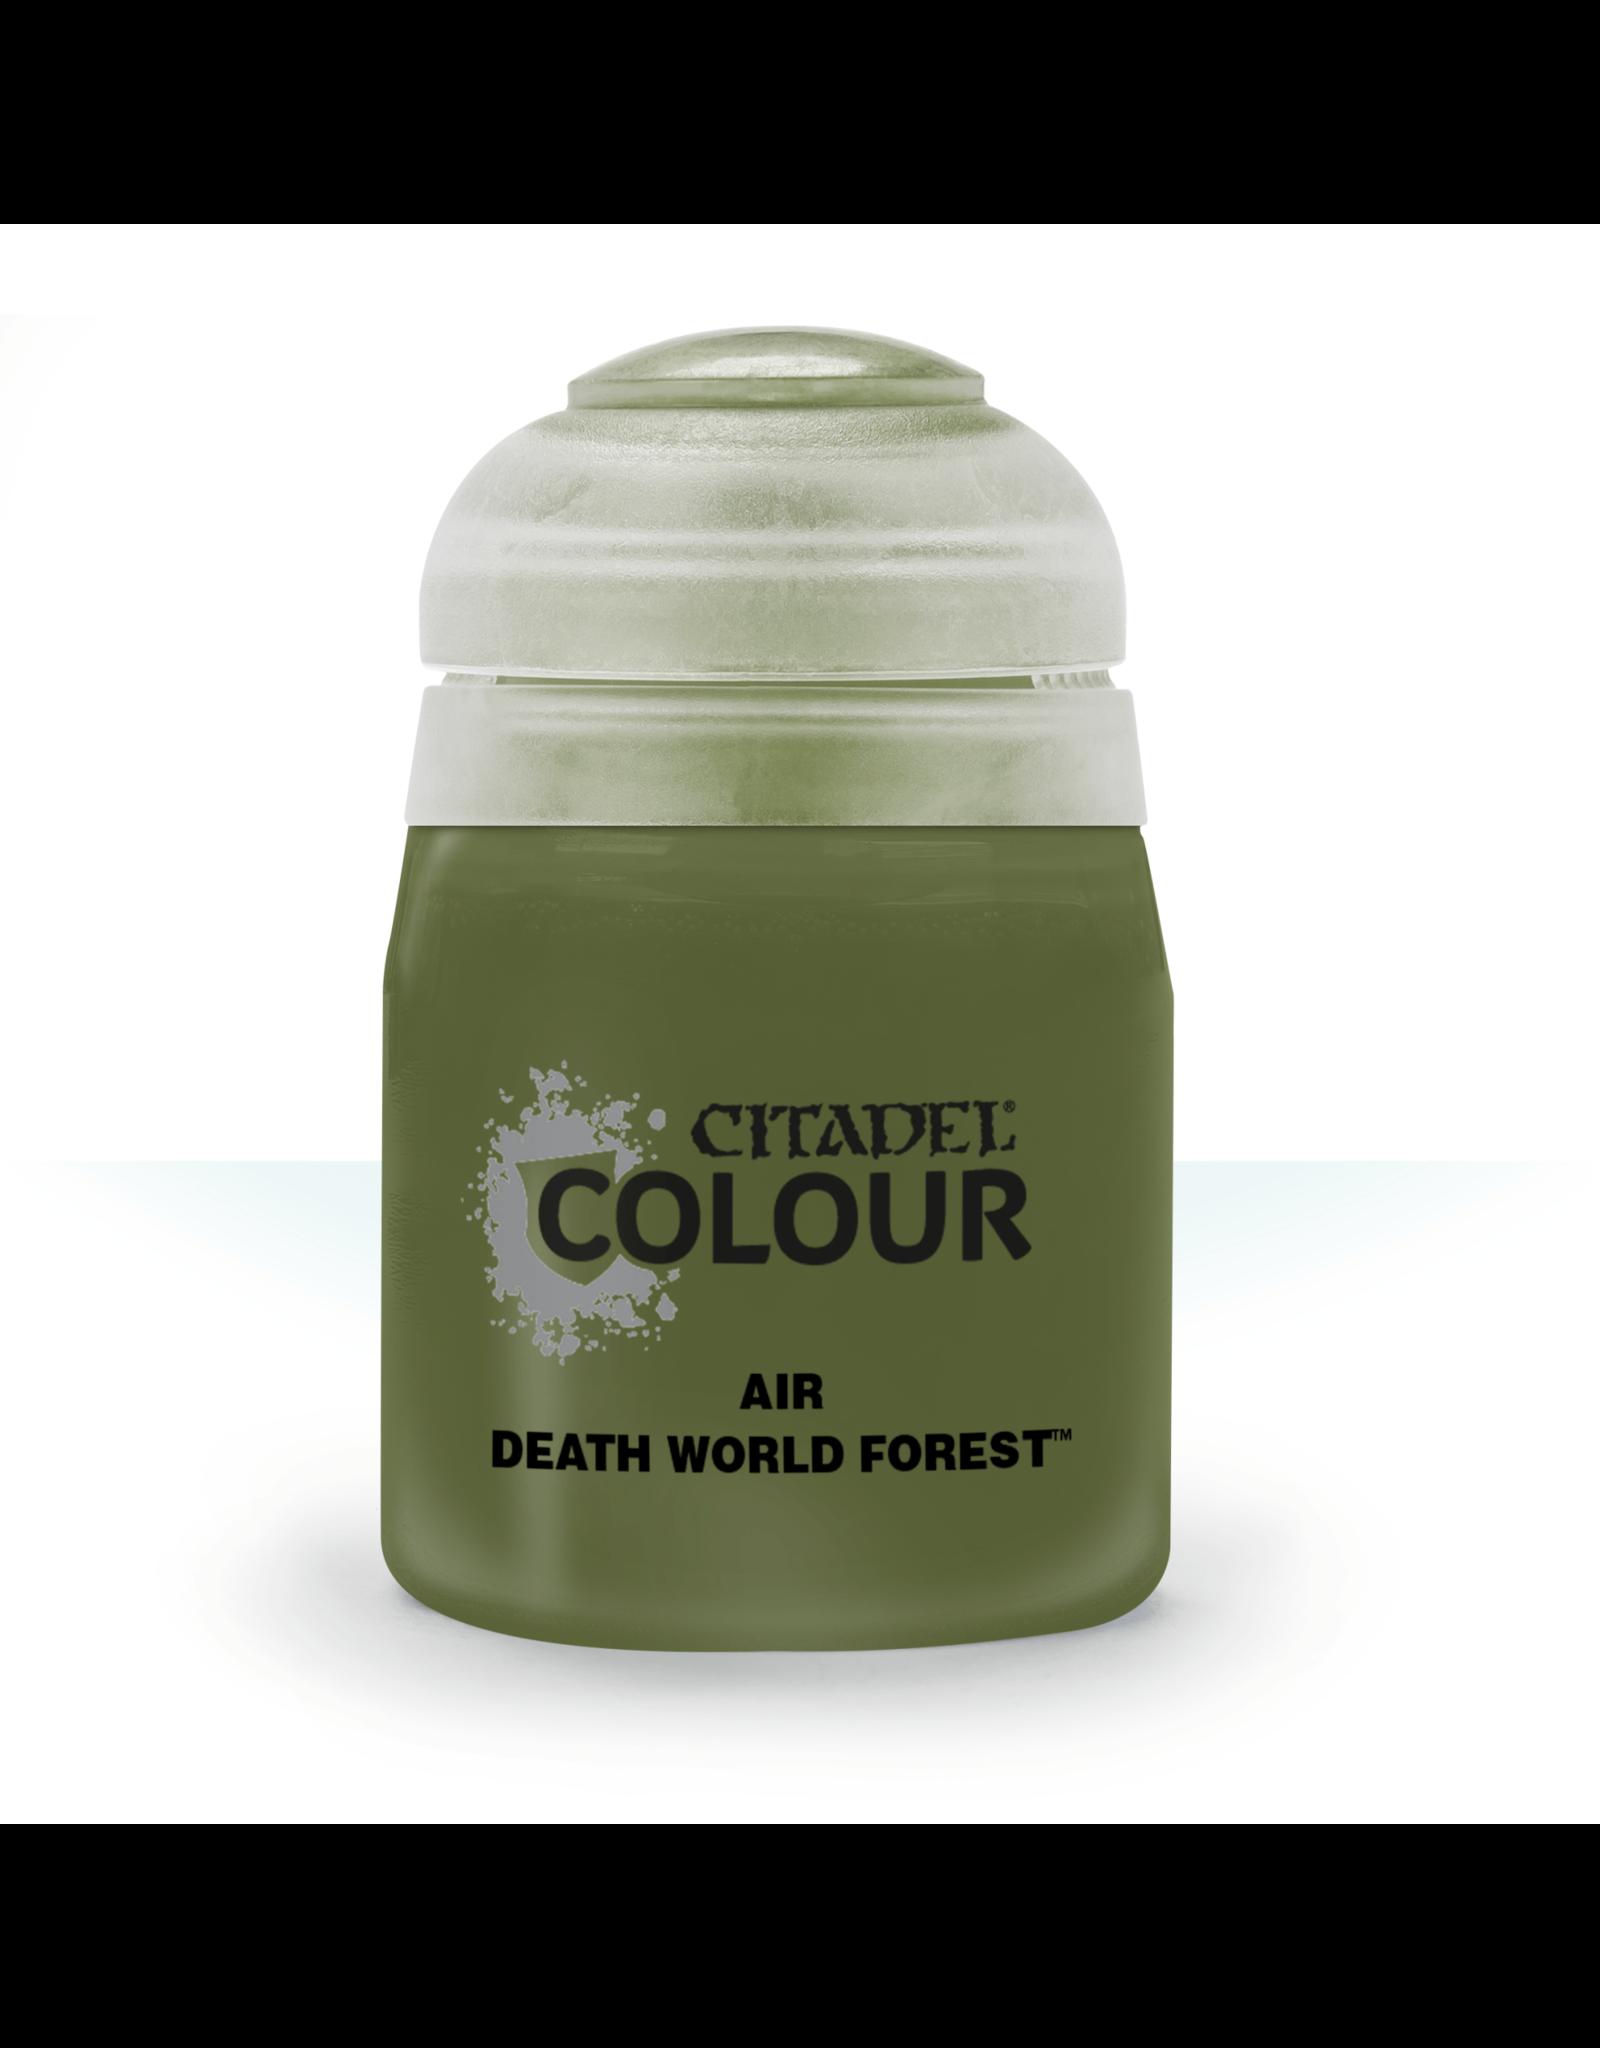 Citadel Citadel Paints Air Paint Deathworld Forest